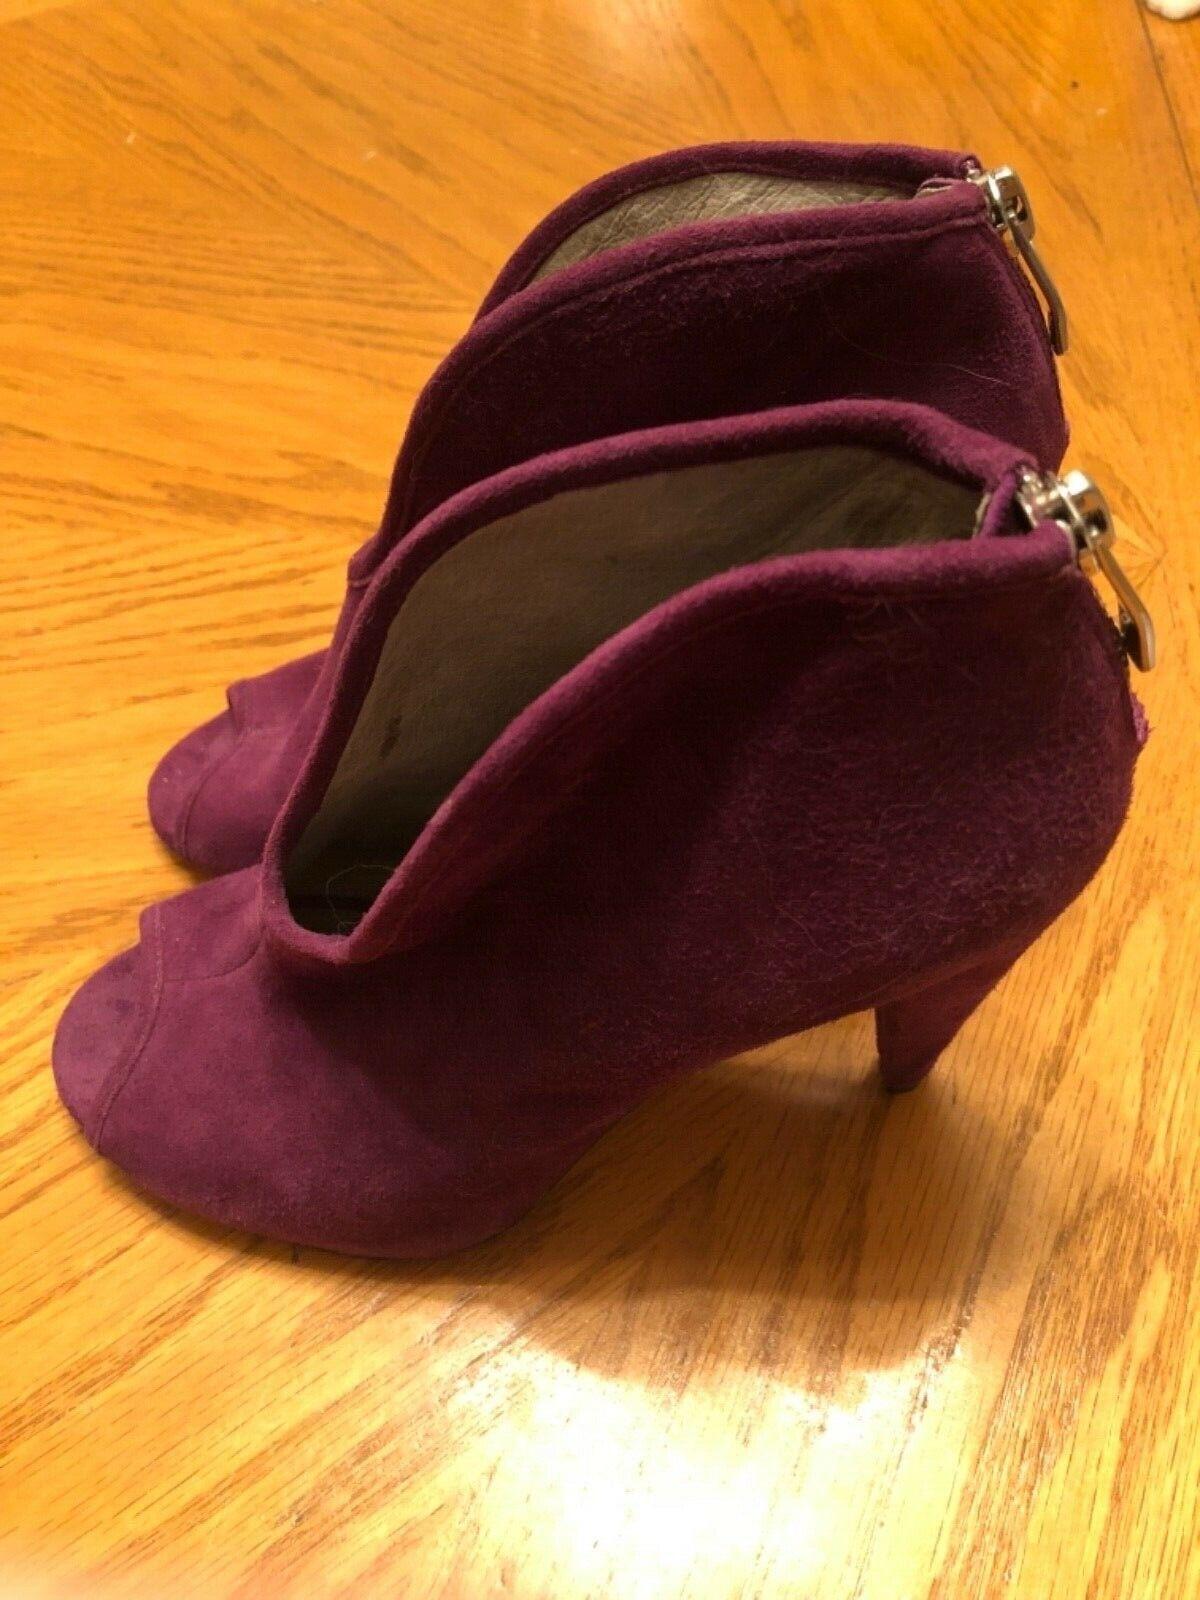 Vince Camuto Purple Suede Heels Size 5.5-6B